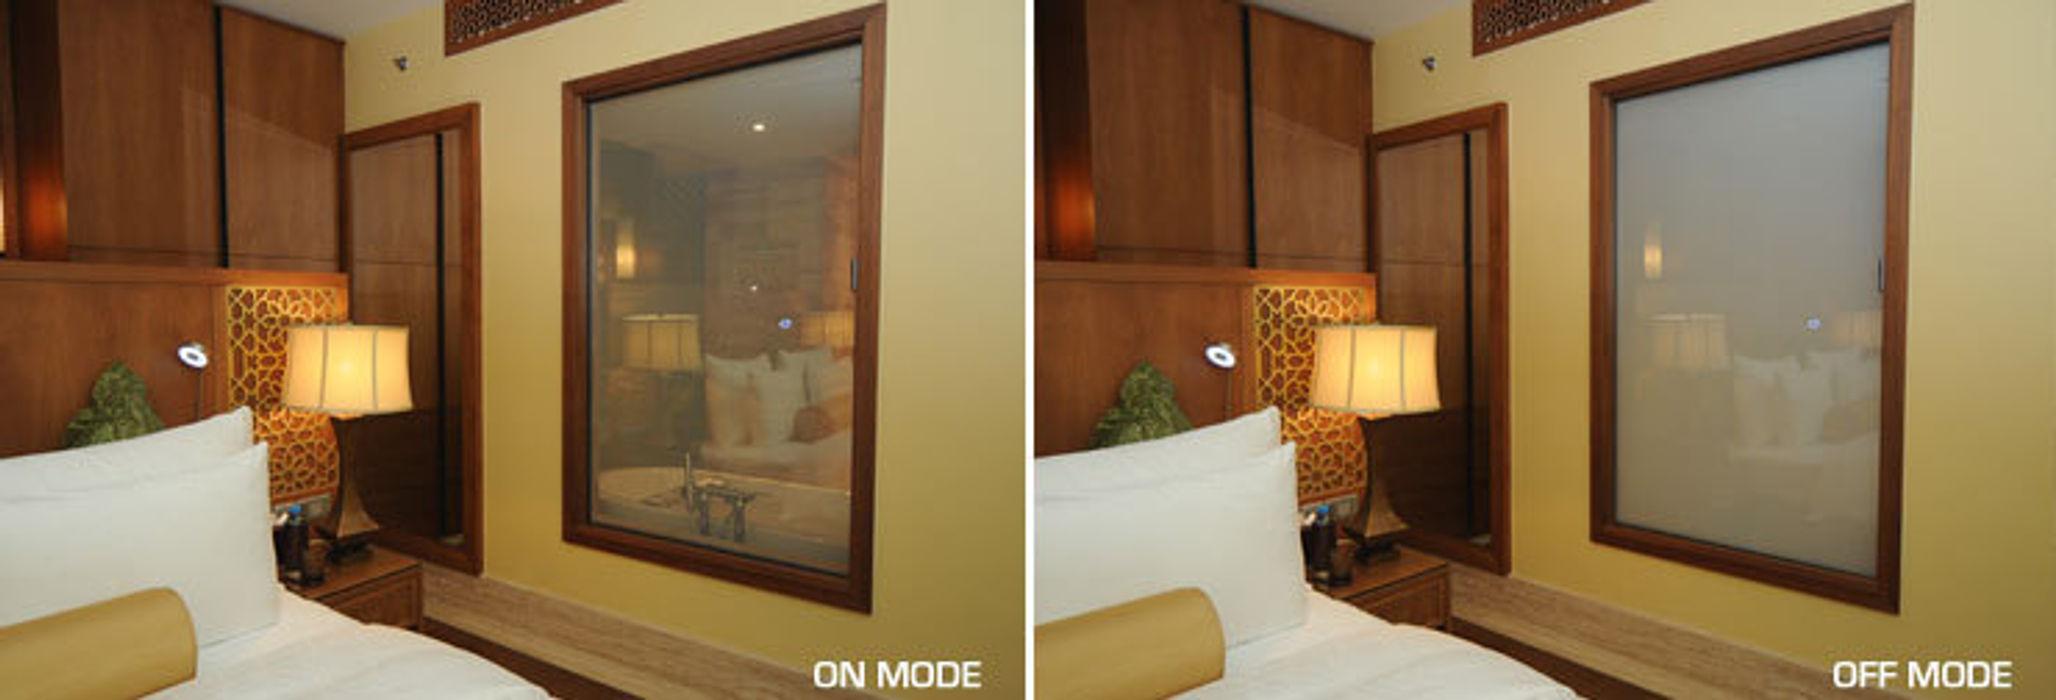 Vidrios de privacidad Modern hotels